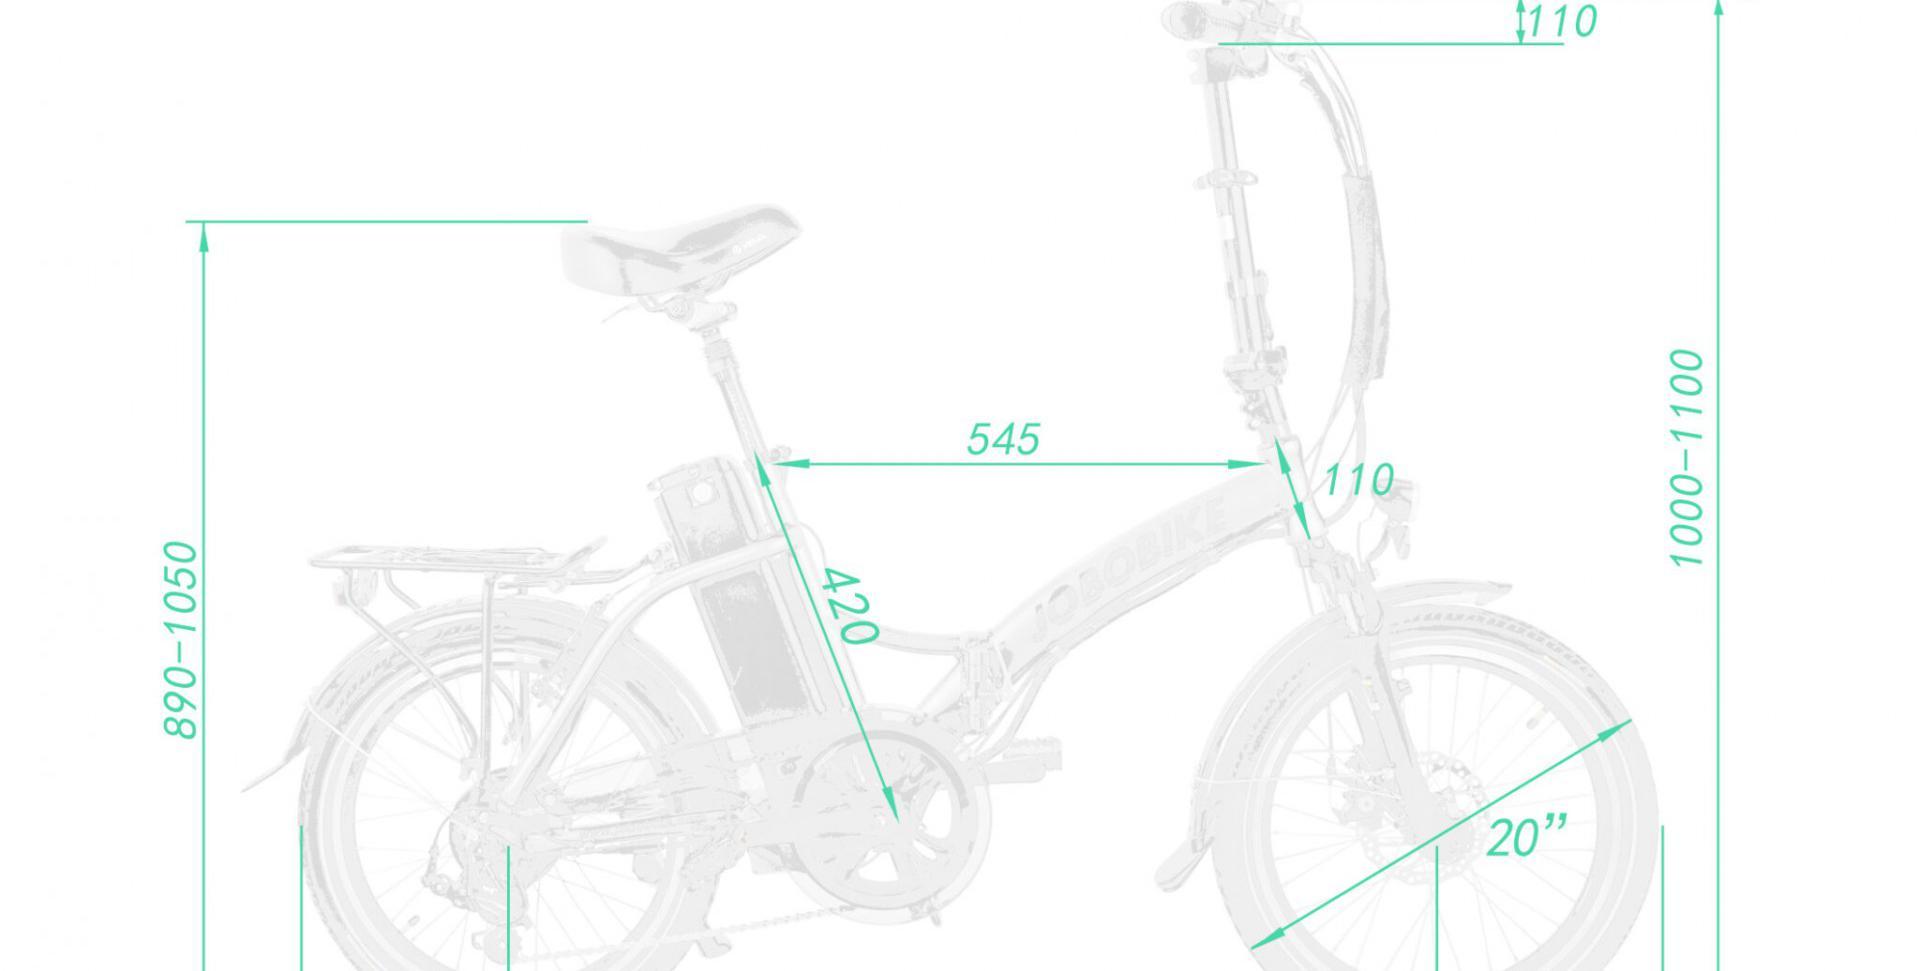 Sam-wymiary-1-2048x1610 (2).jpg